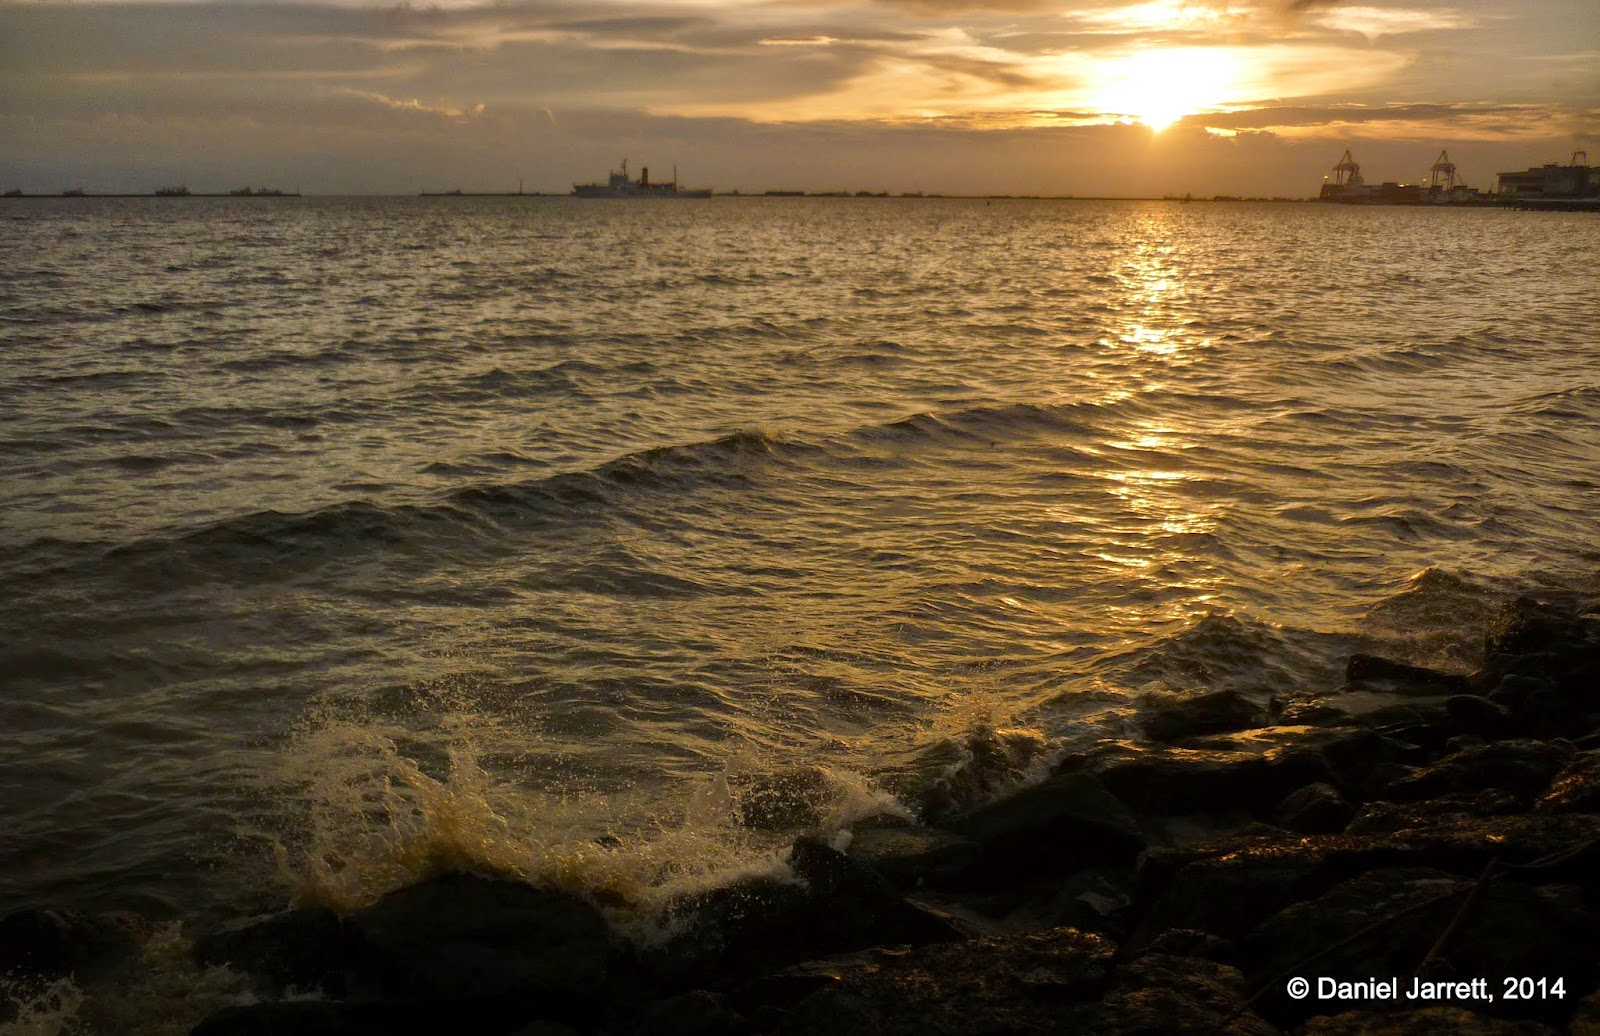 Waves Manila Bay